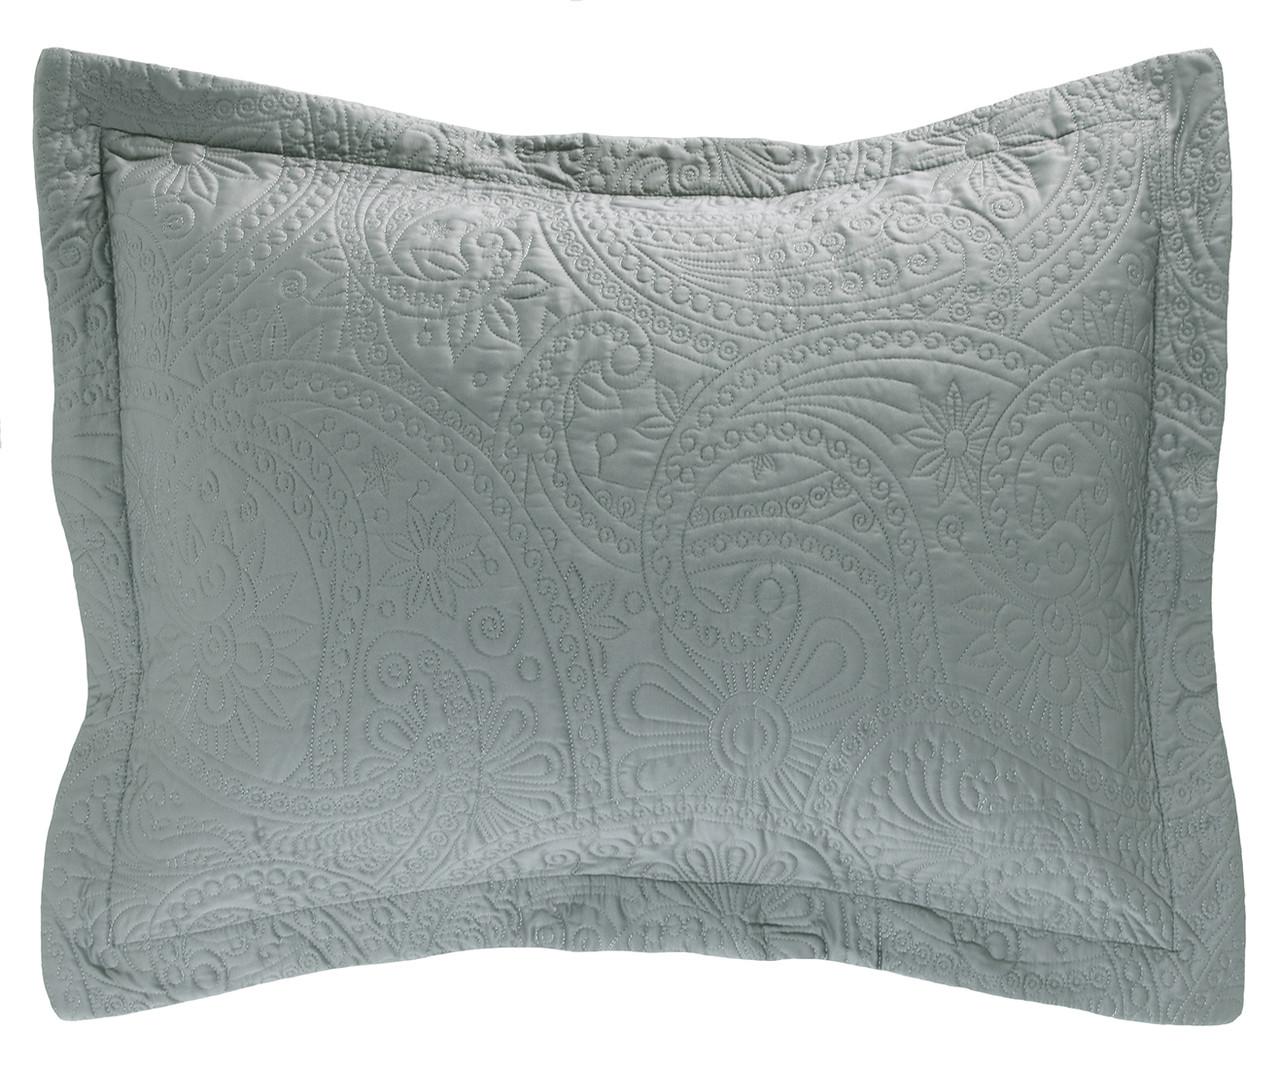 lenore pillow sham silver. Black Bedroom Furniture Sets. Home Design Ideas